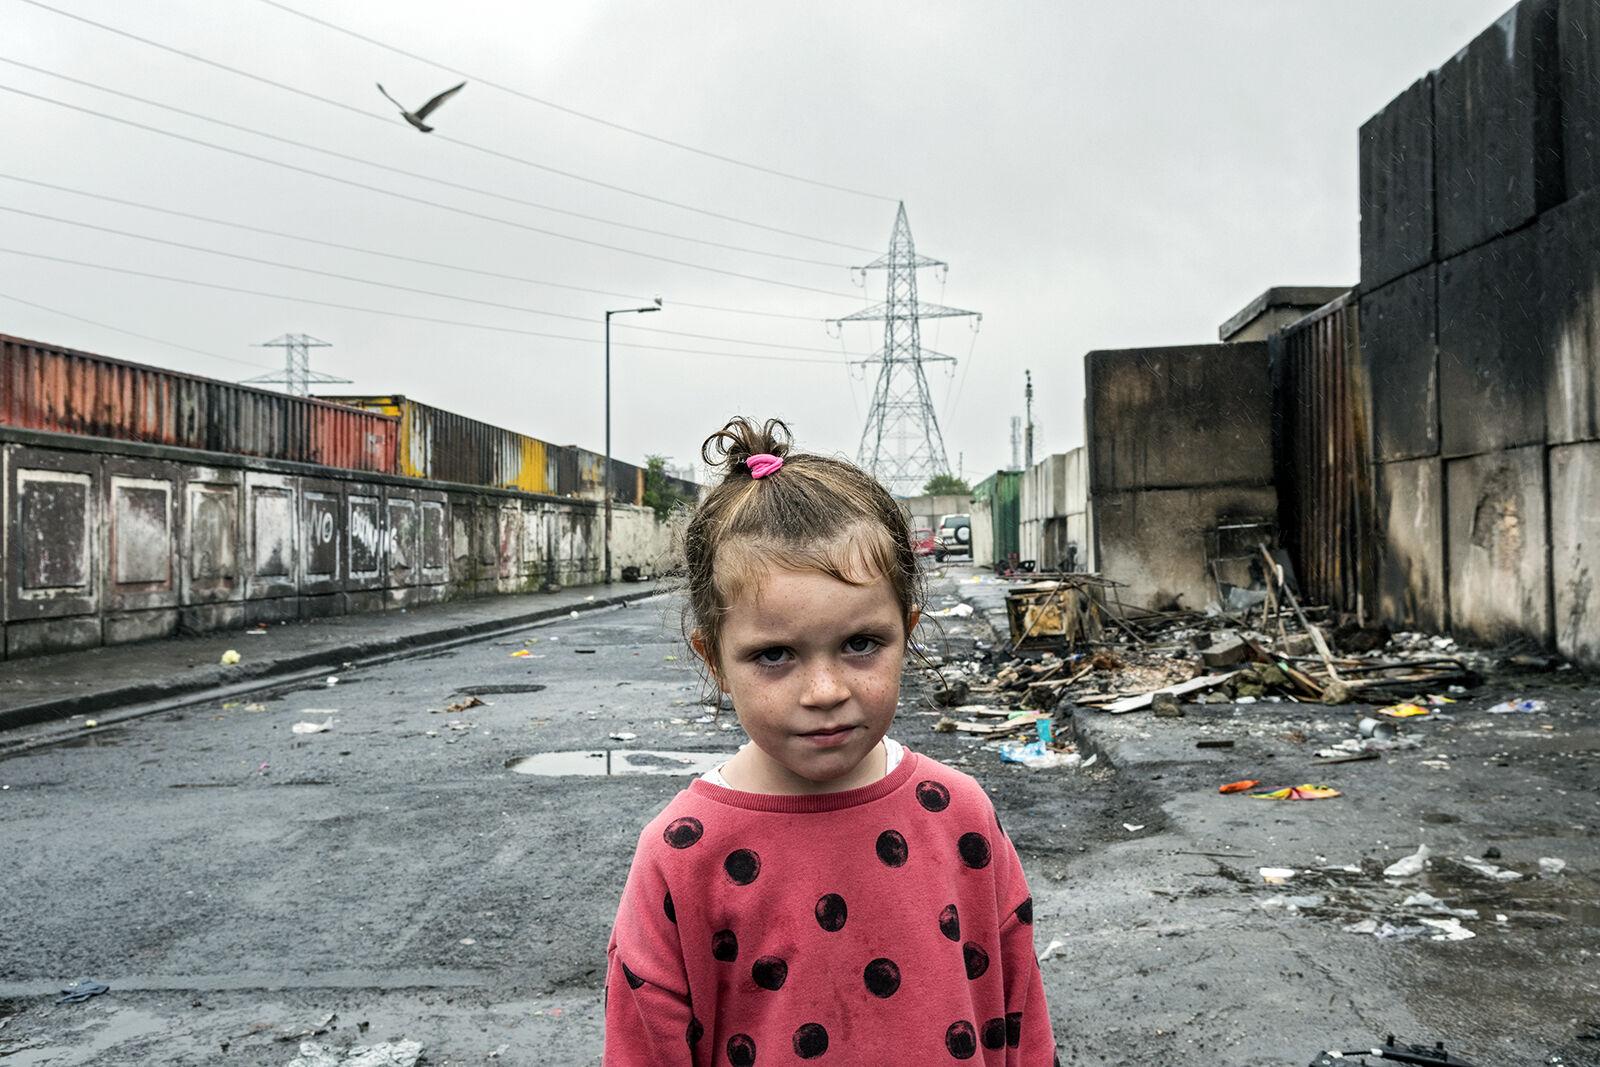 Girl With Polka Dot Shirt, Dublin, Ireland 2020